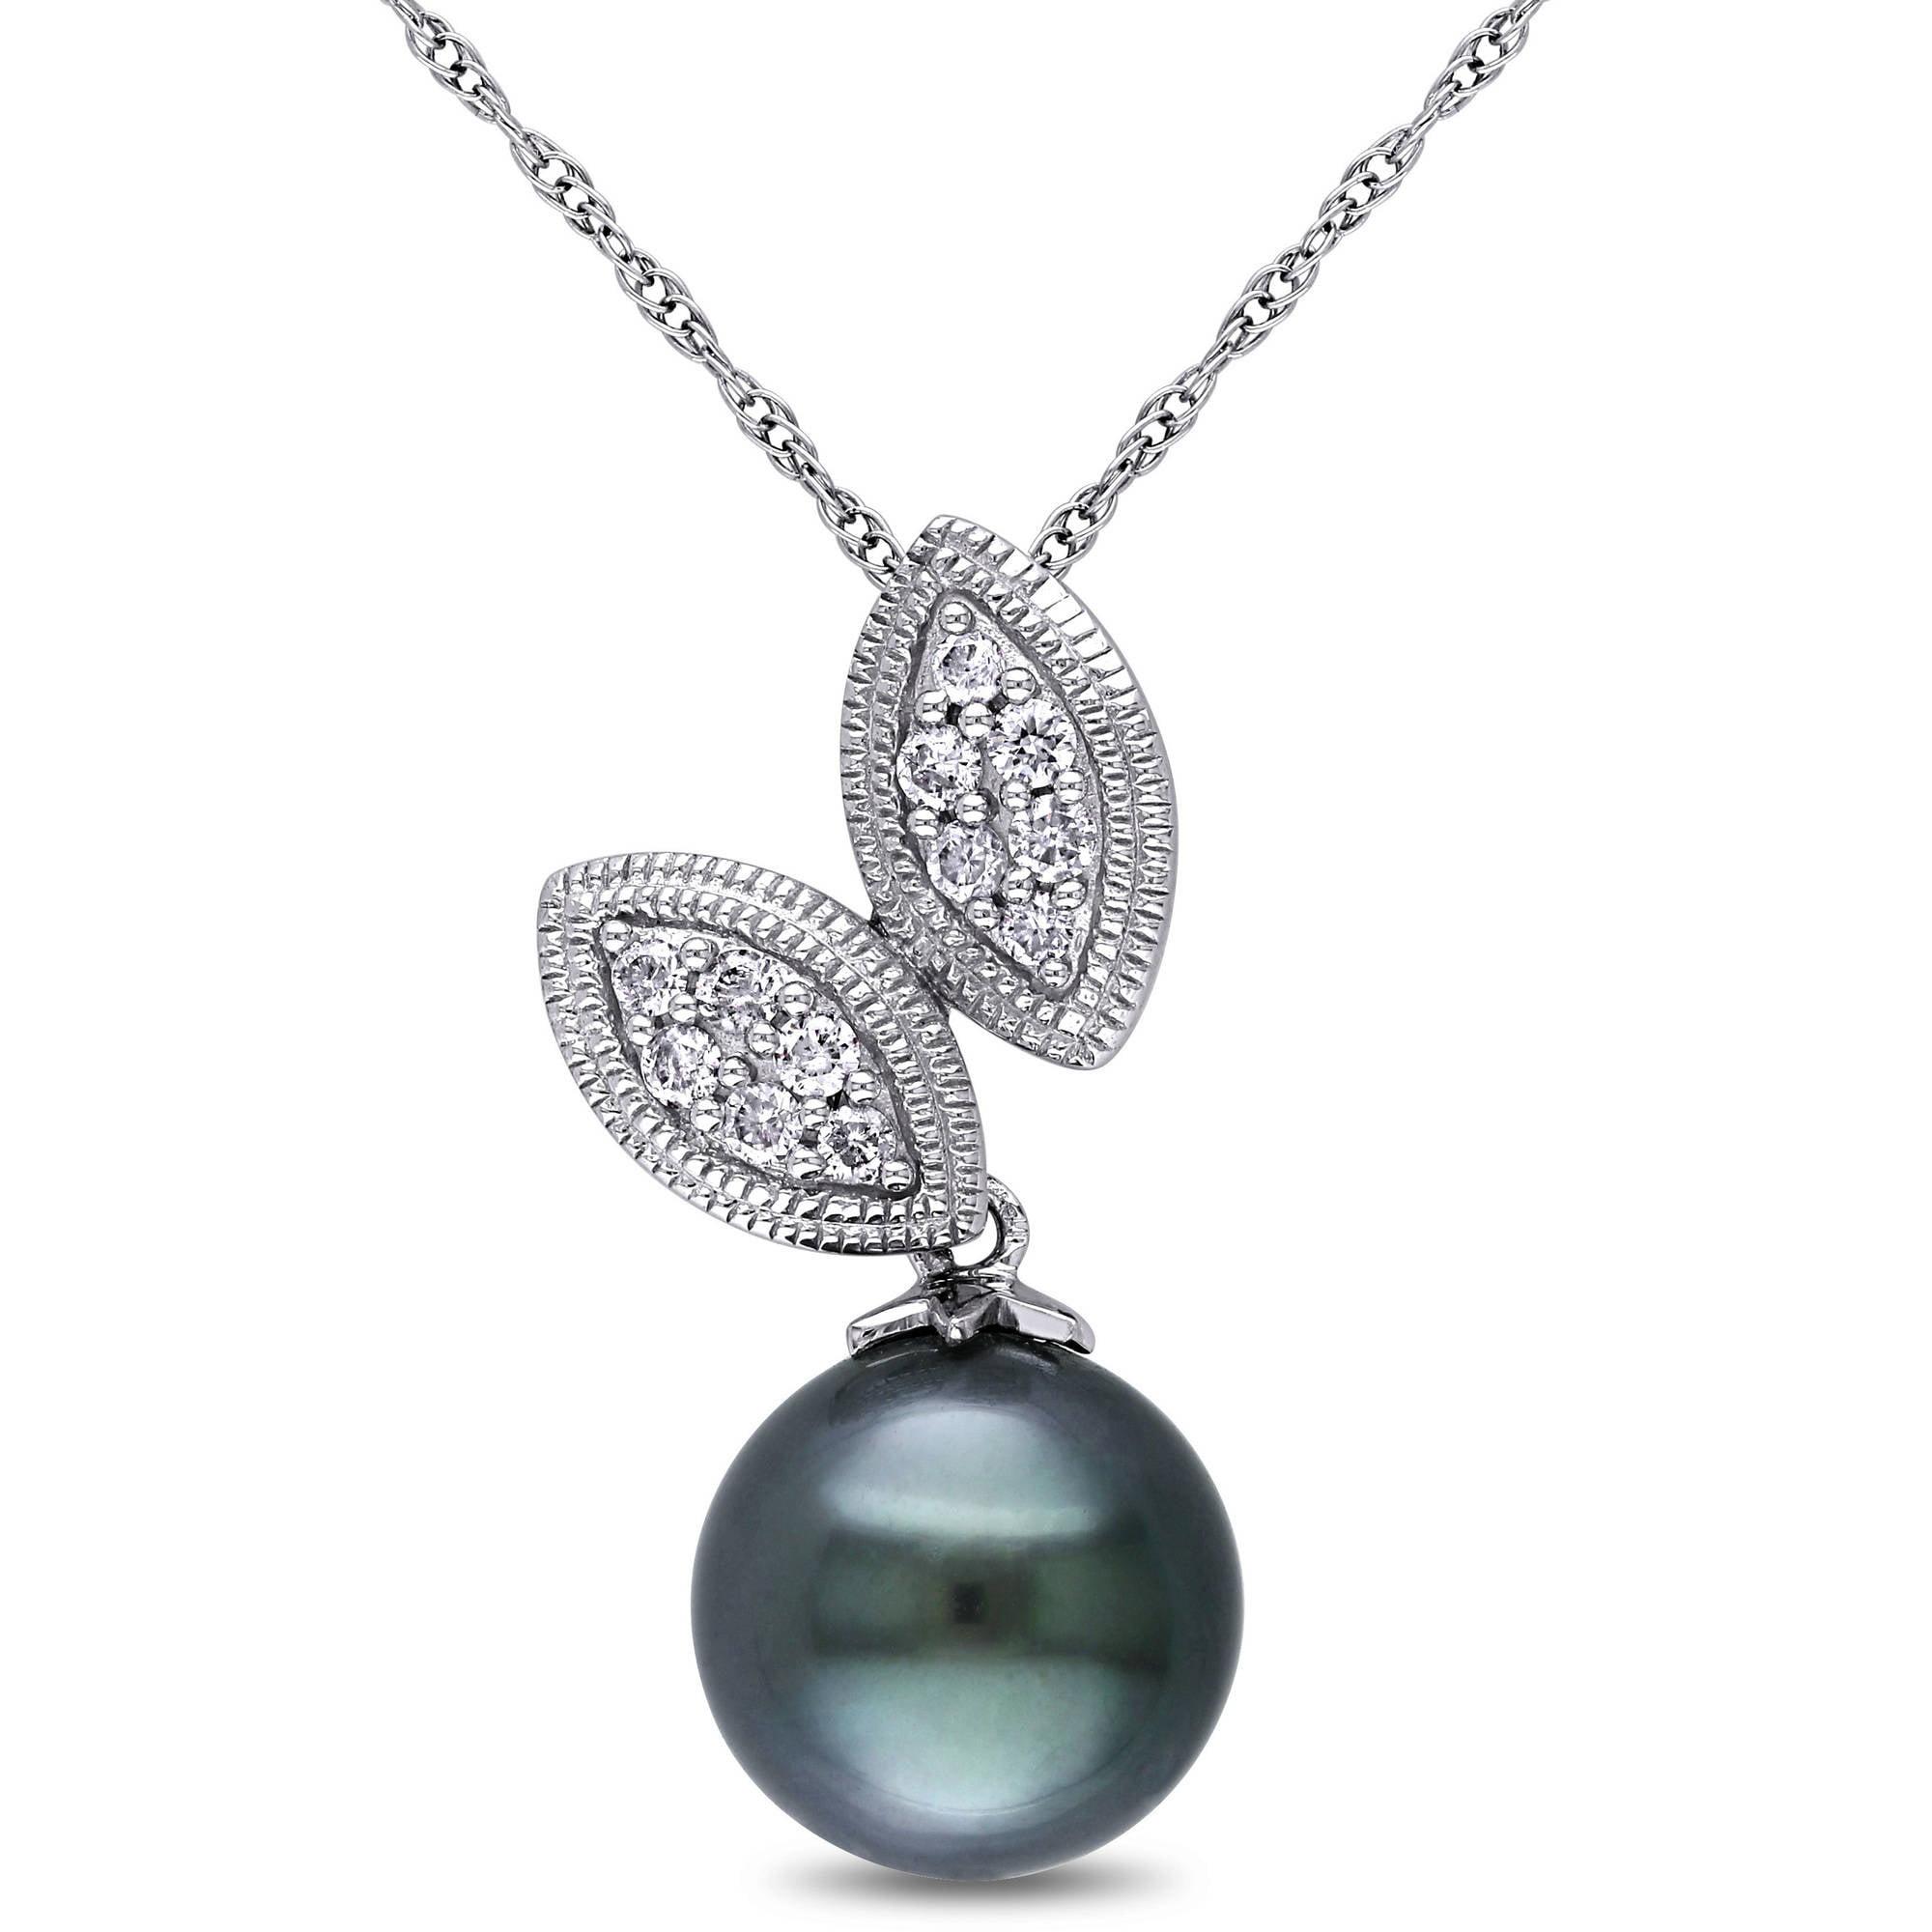 9-9.5mm Black Round Tahitian Pearl and 1/6 Carat T.W. Diamond 10kt White Gold Fashion Pendant, 17